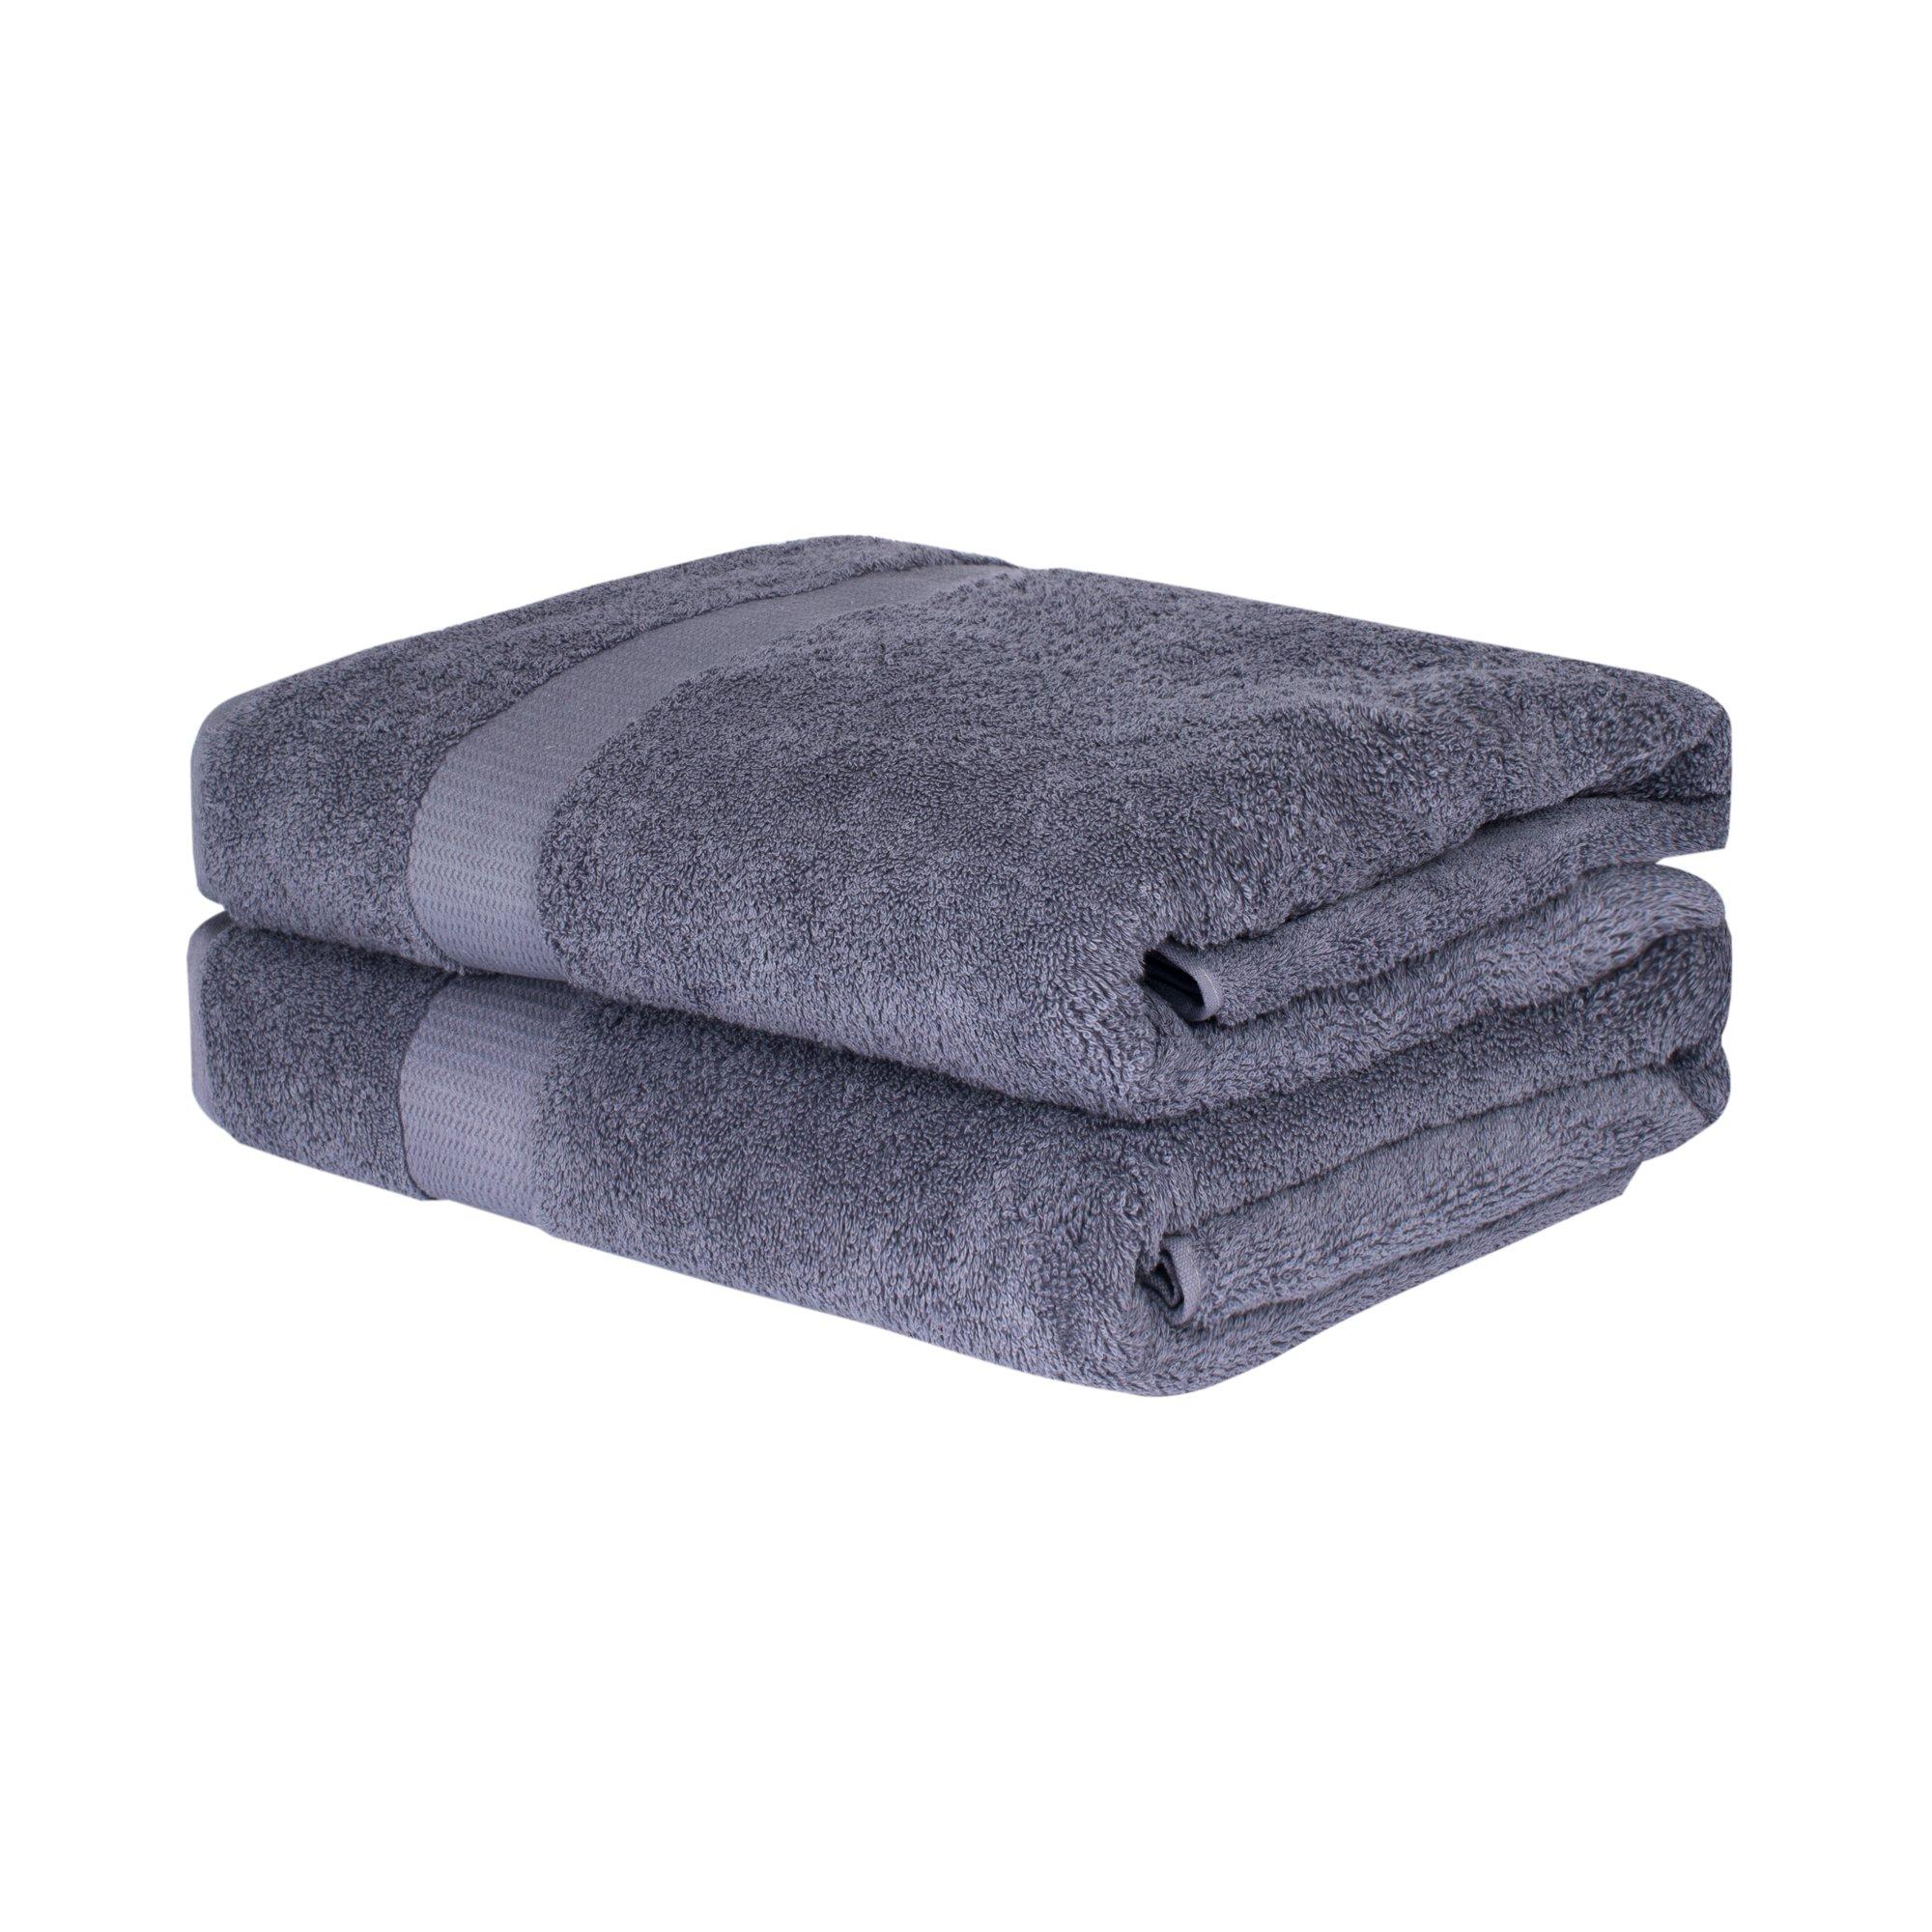 EGETOLIA Premium Oversized Bath Towel 35x70 inch Turkish Cotton Towel for Beach Hotel Spa Bathroom Maximum Softness and Highly Absorbent 2 Bulk Pack, GREY